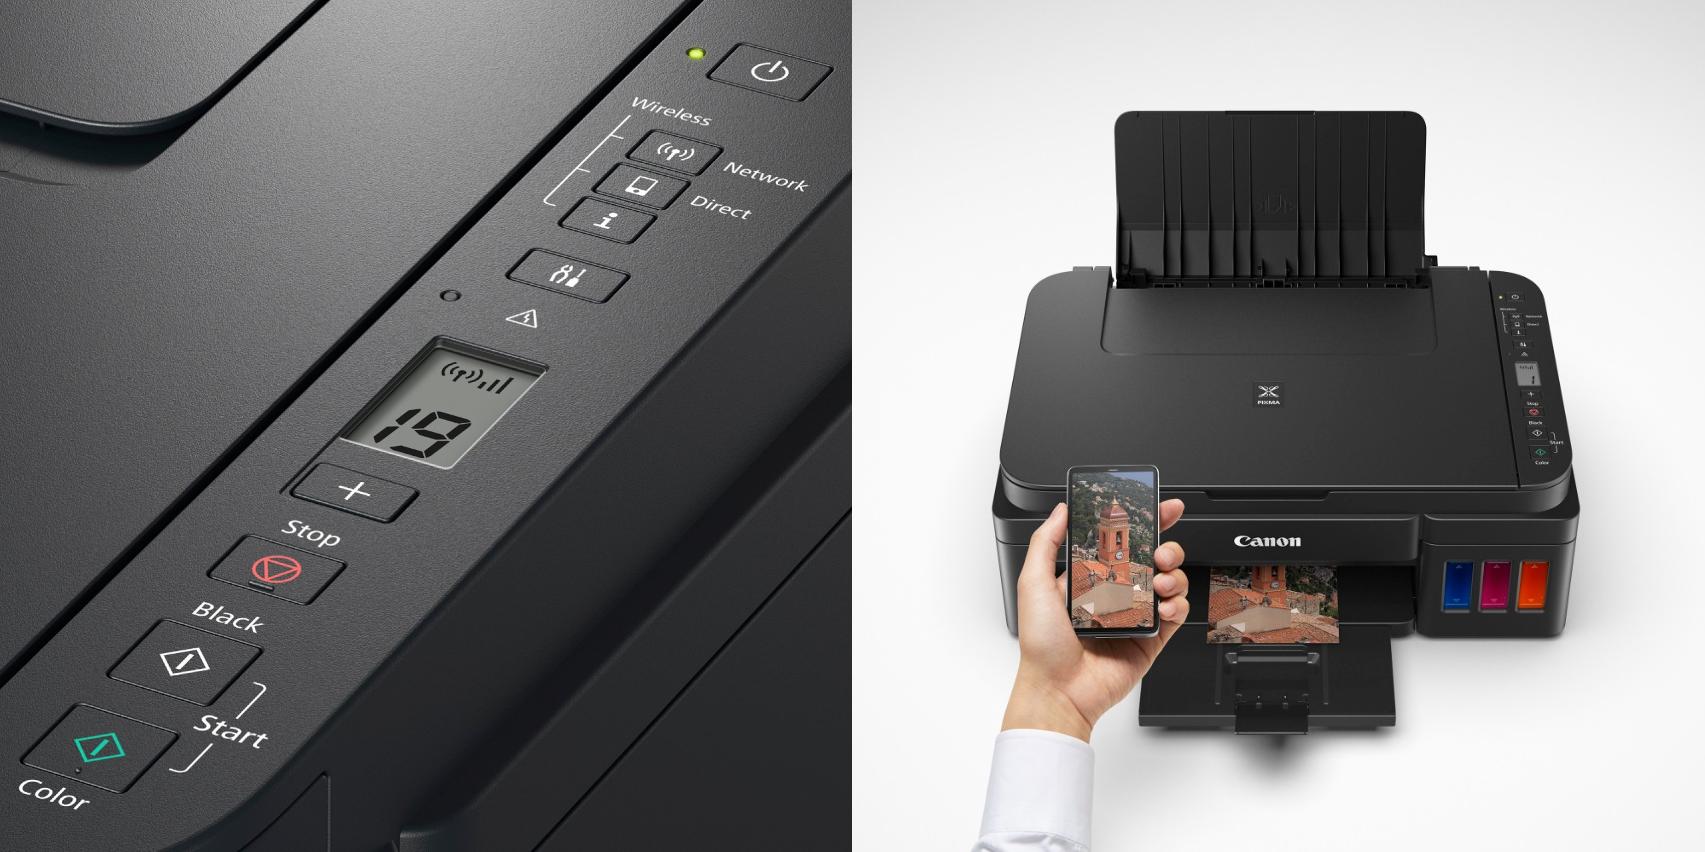 Impresora Canon Pixma 3110 + pantalla LCD